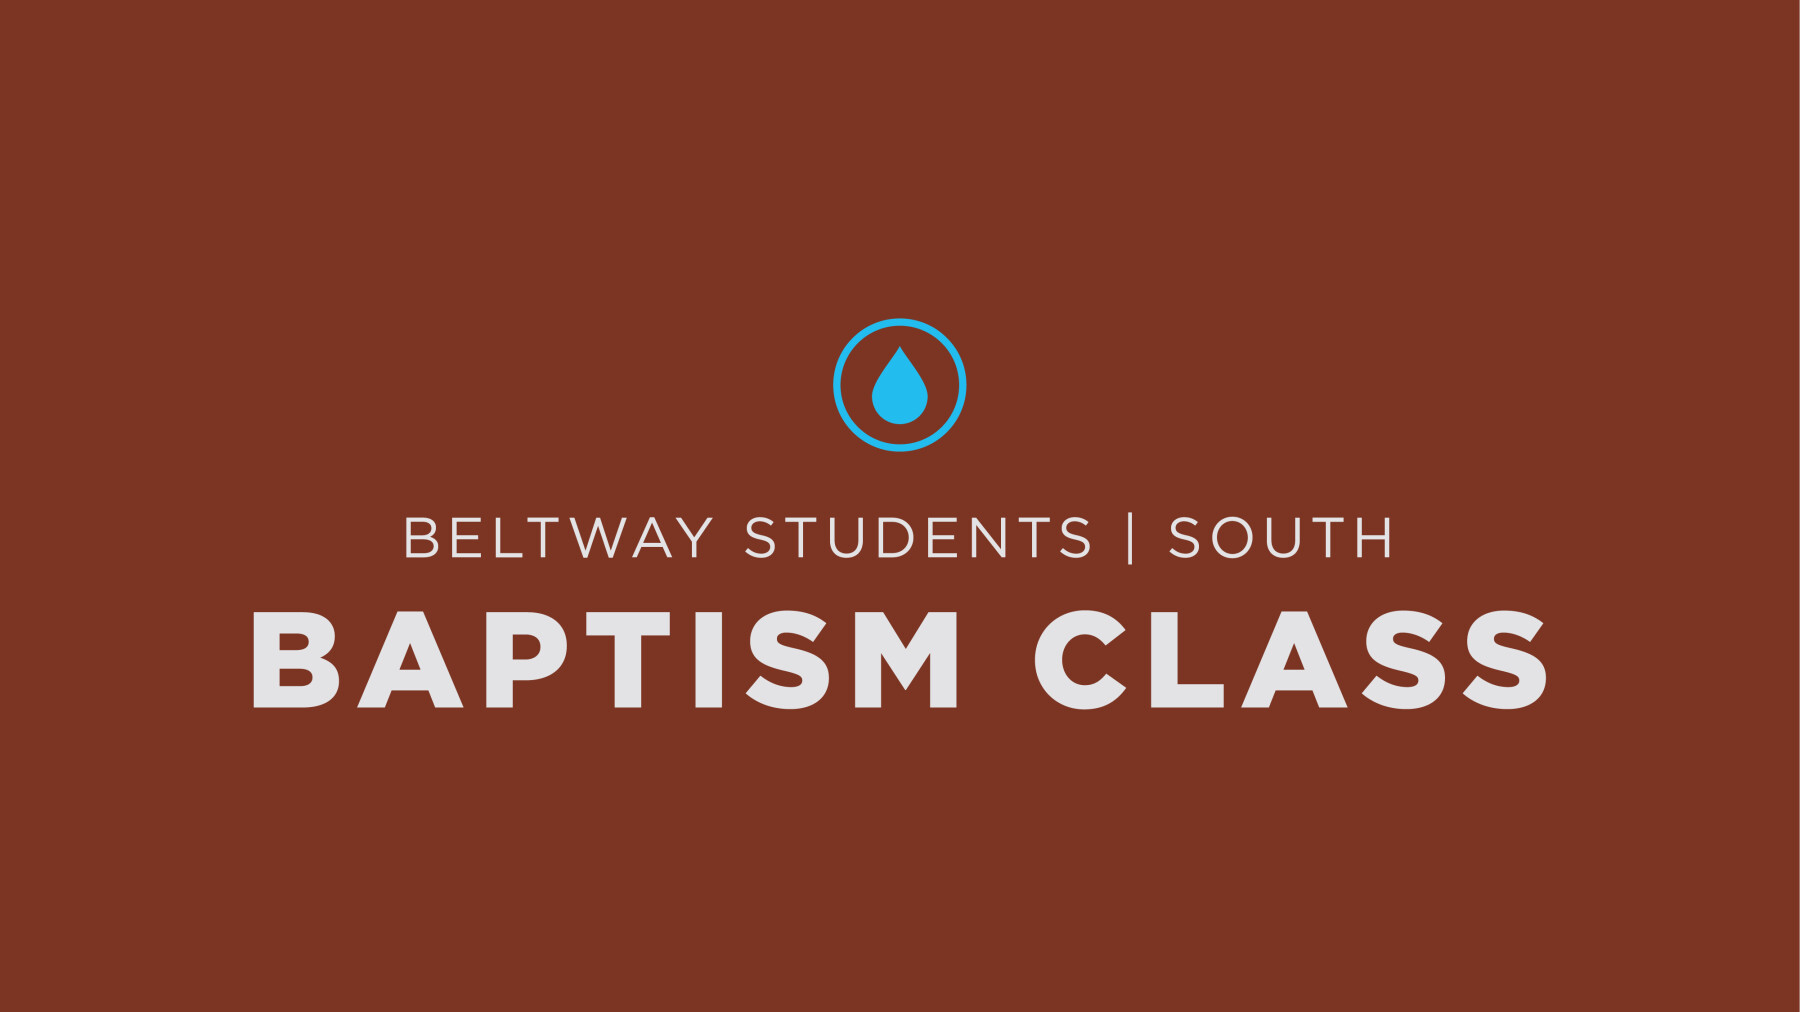 BSM Baptism Class SOUTH